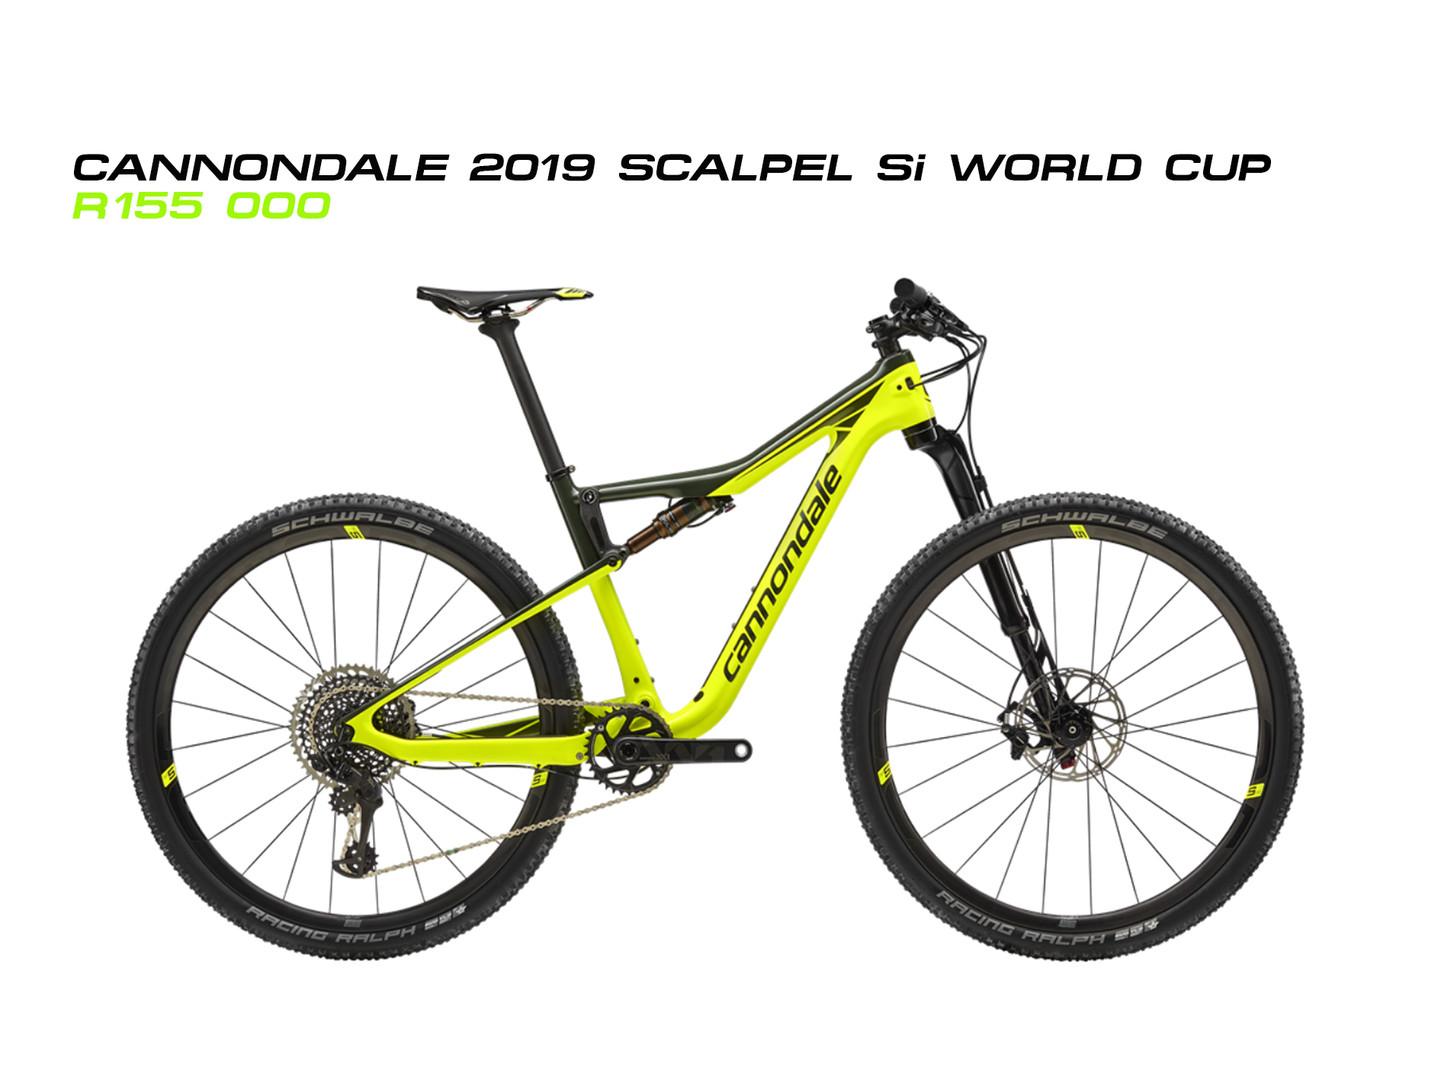 2019 Scalpel Si World cup